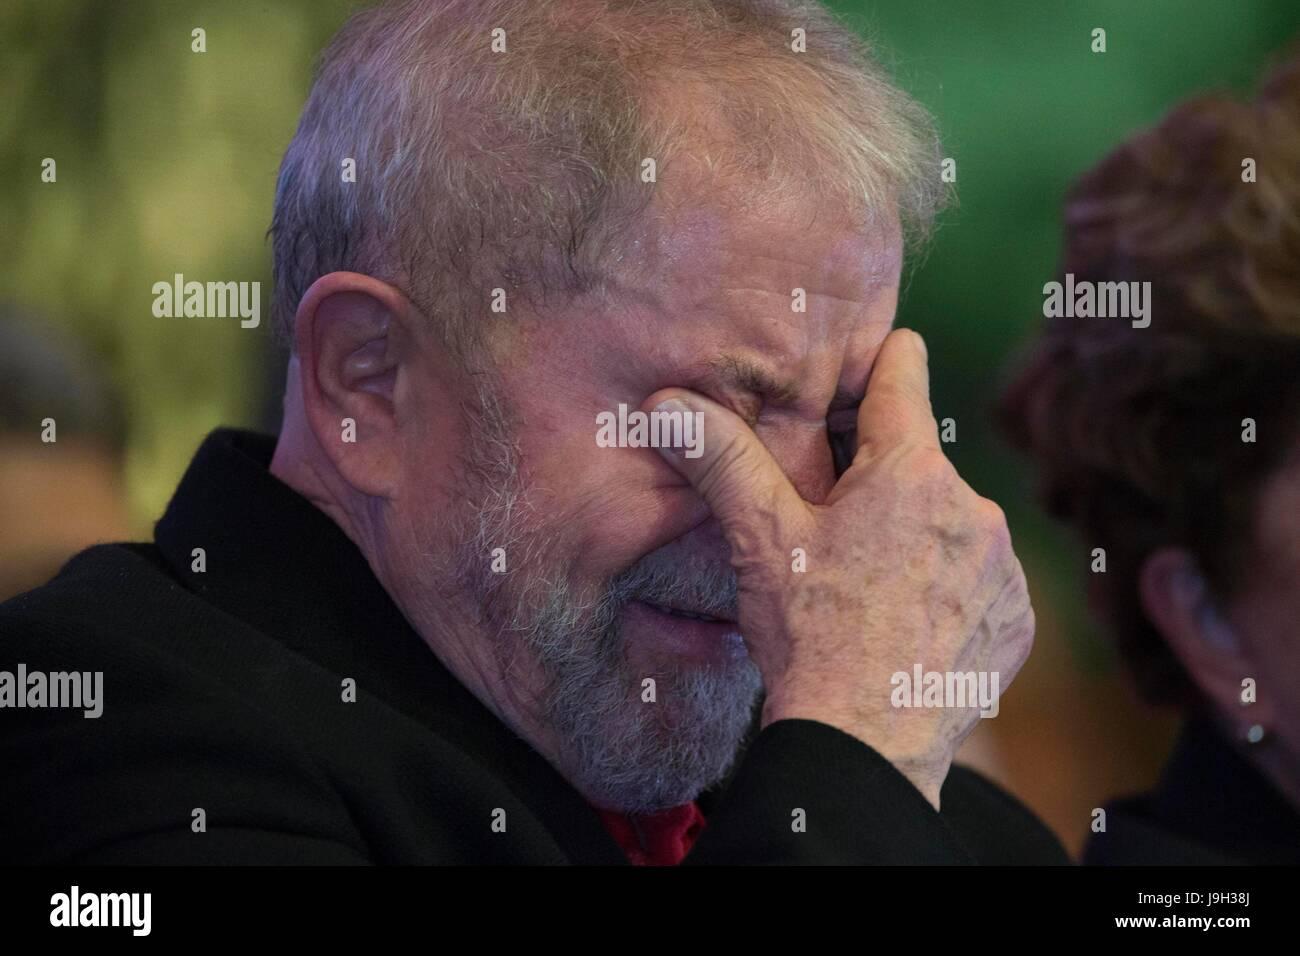 Former Brazilian Presidents Luiz Inacio Lula da Silva participates in the 6th National Congress of the workers' - Stock Image